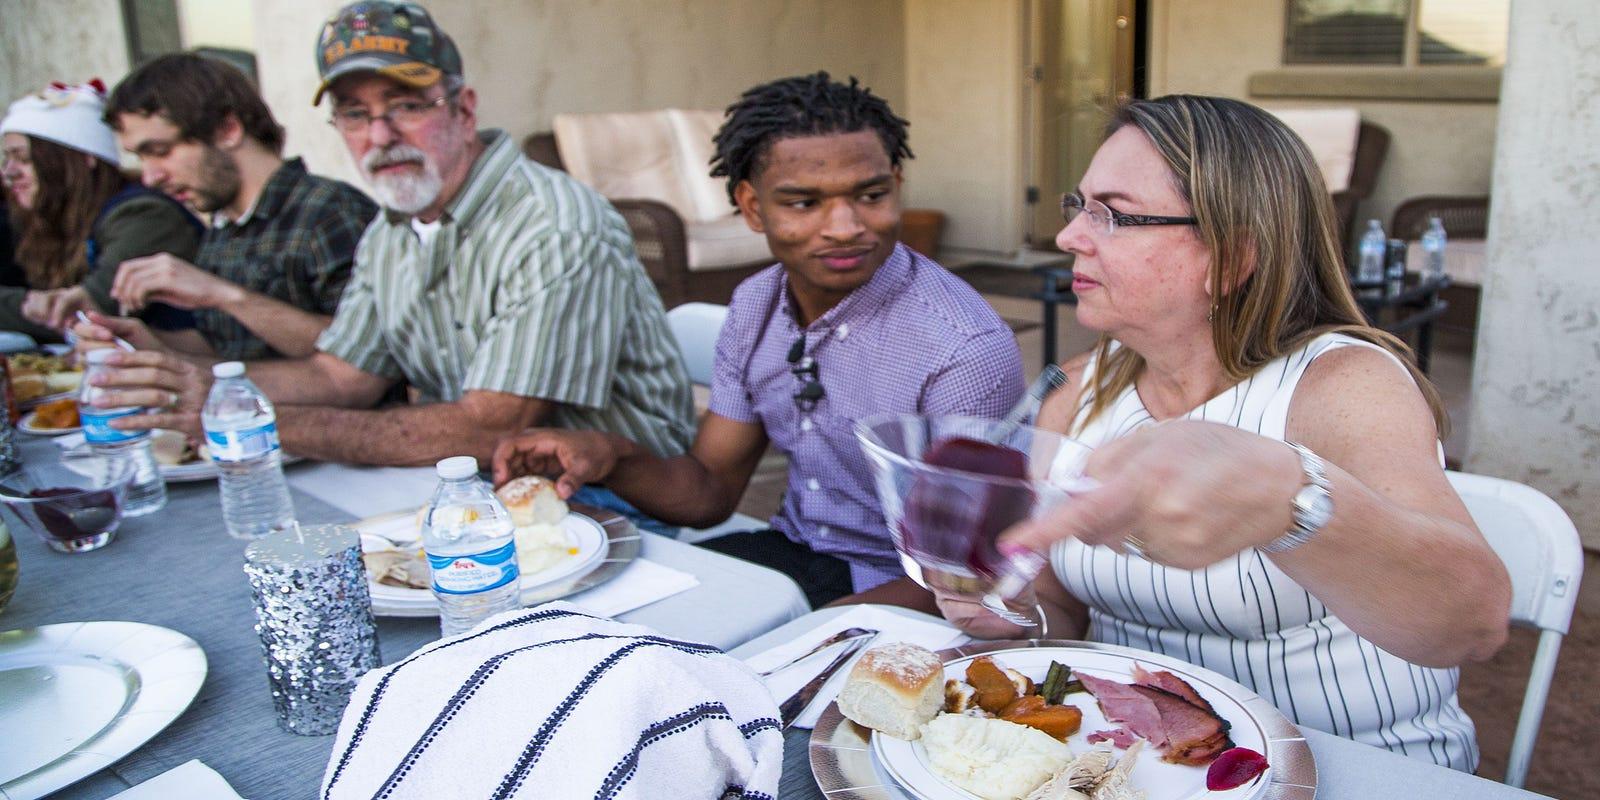 Grandma S Accidental Thanksgiving Invite Makes For Memorable Meal